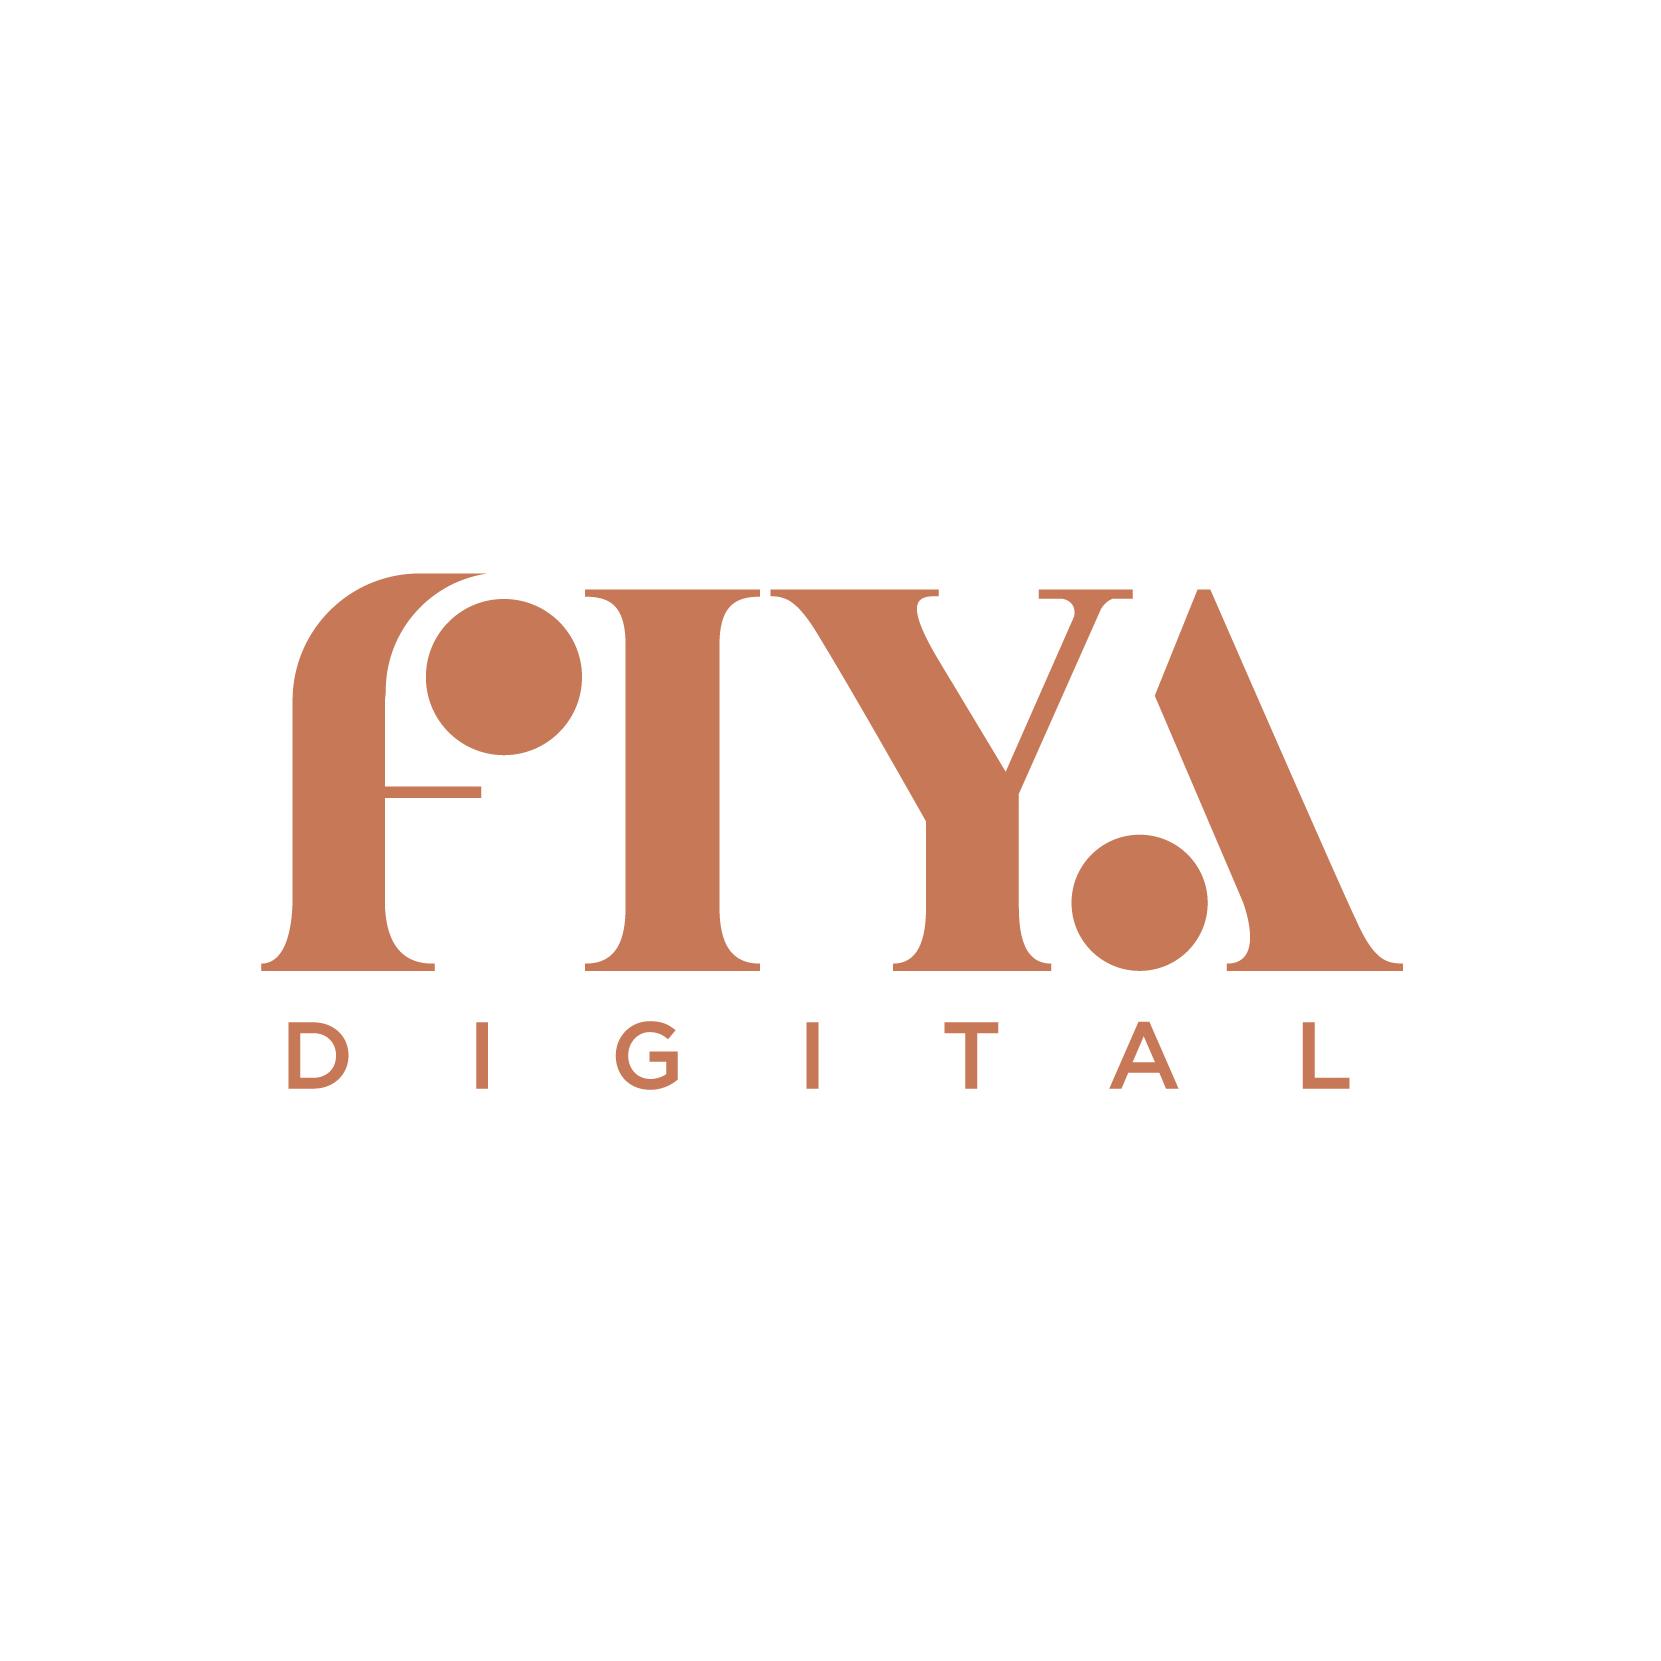 FIYA Digital internships in Central London, London